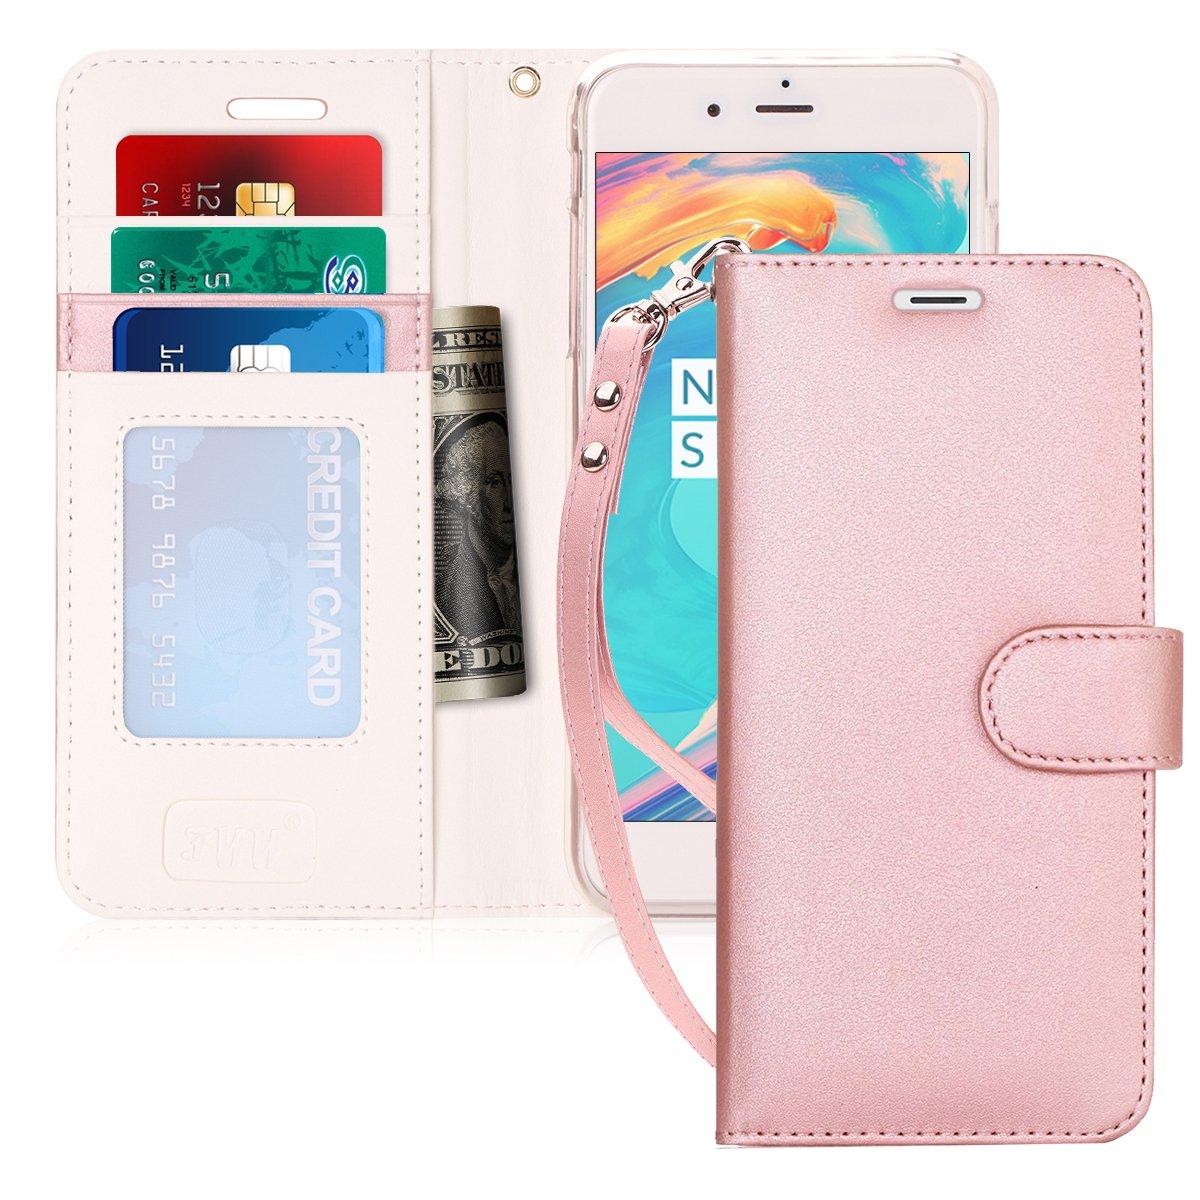 designer iphone 7 plus cases amazon comfyy luxury pu leather wallet case for iphone 7 plus iphone 8 plus, [